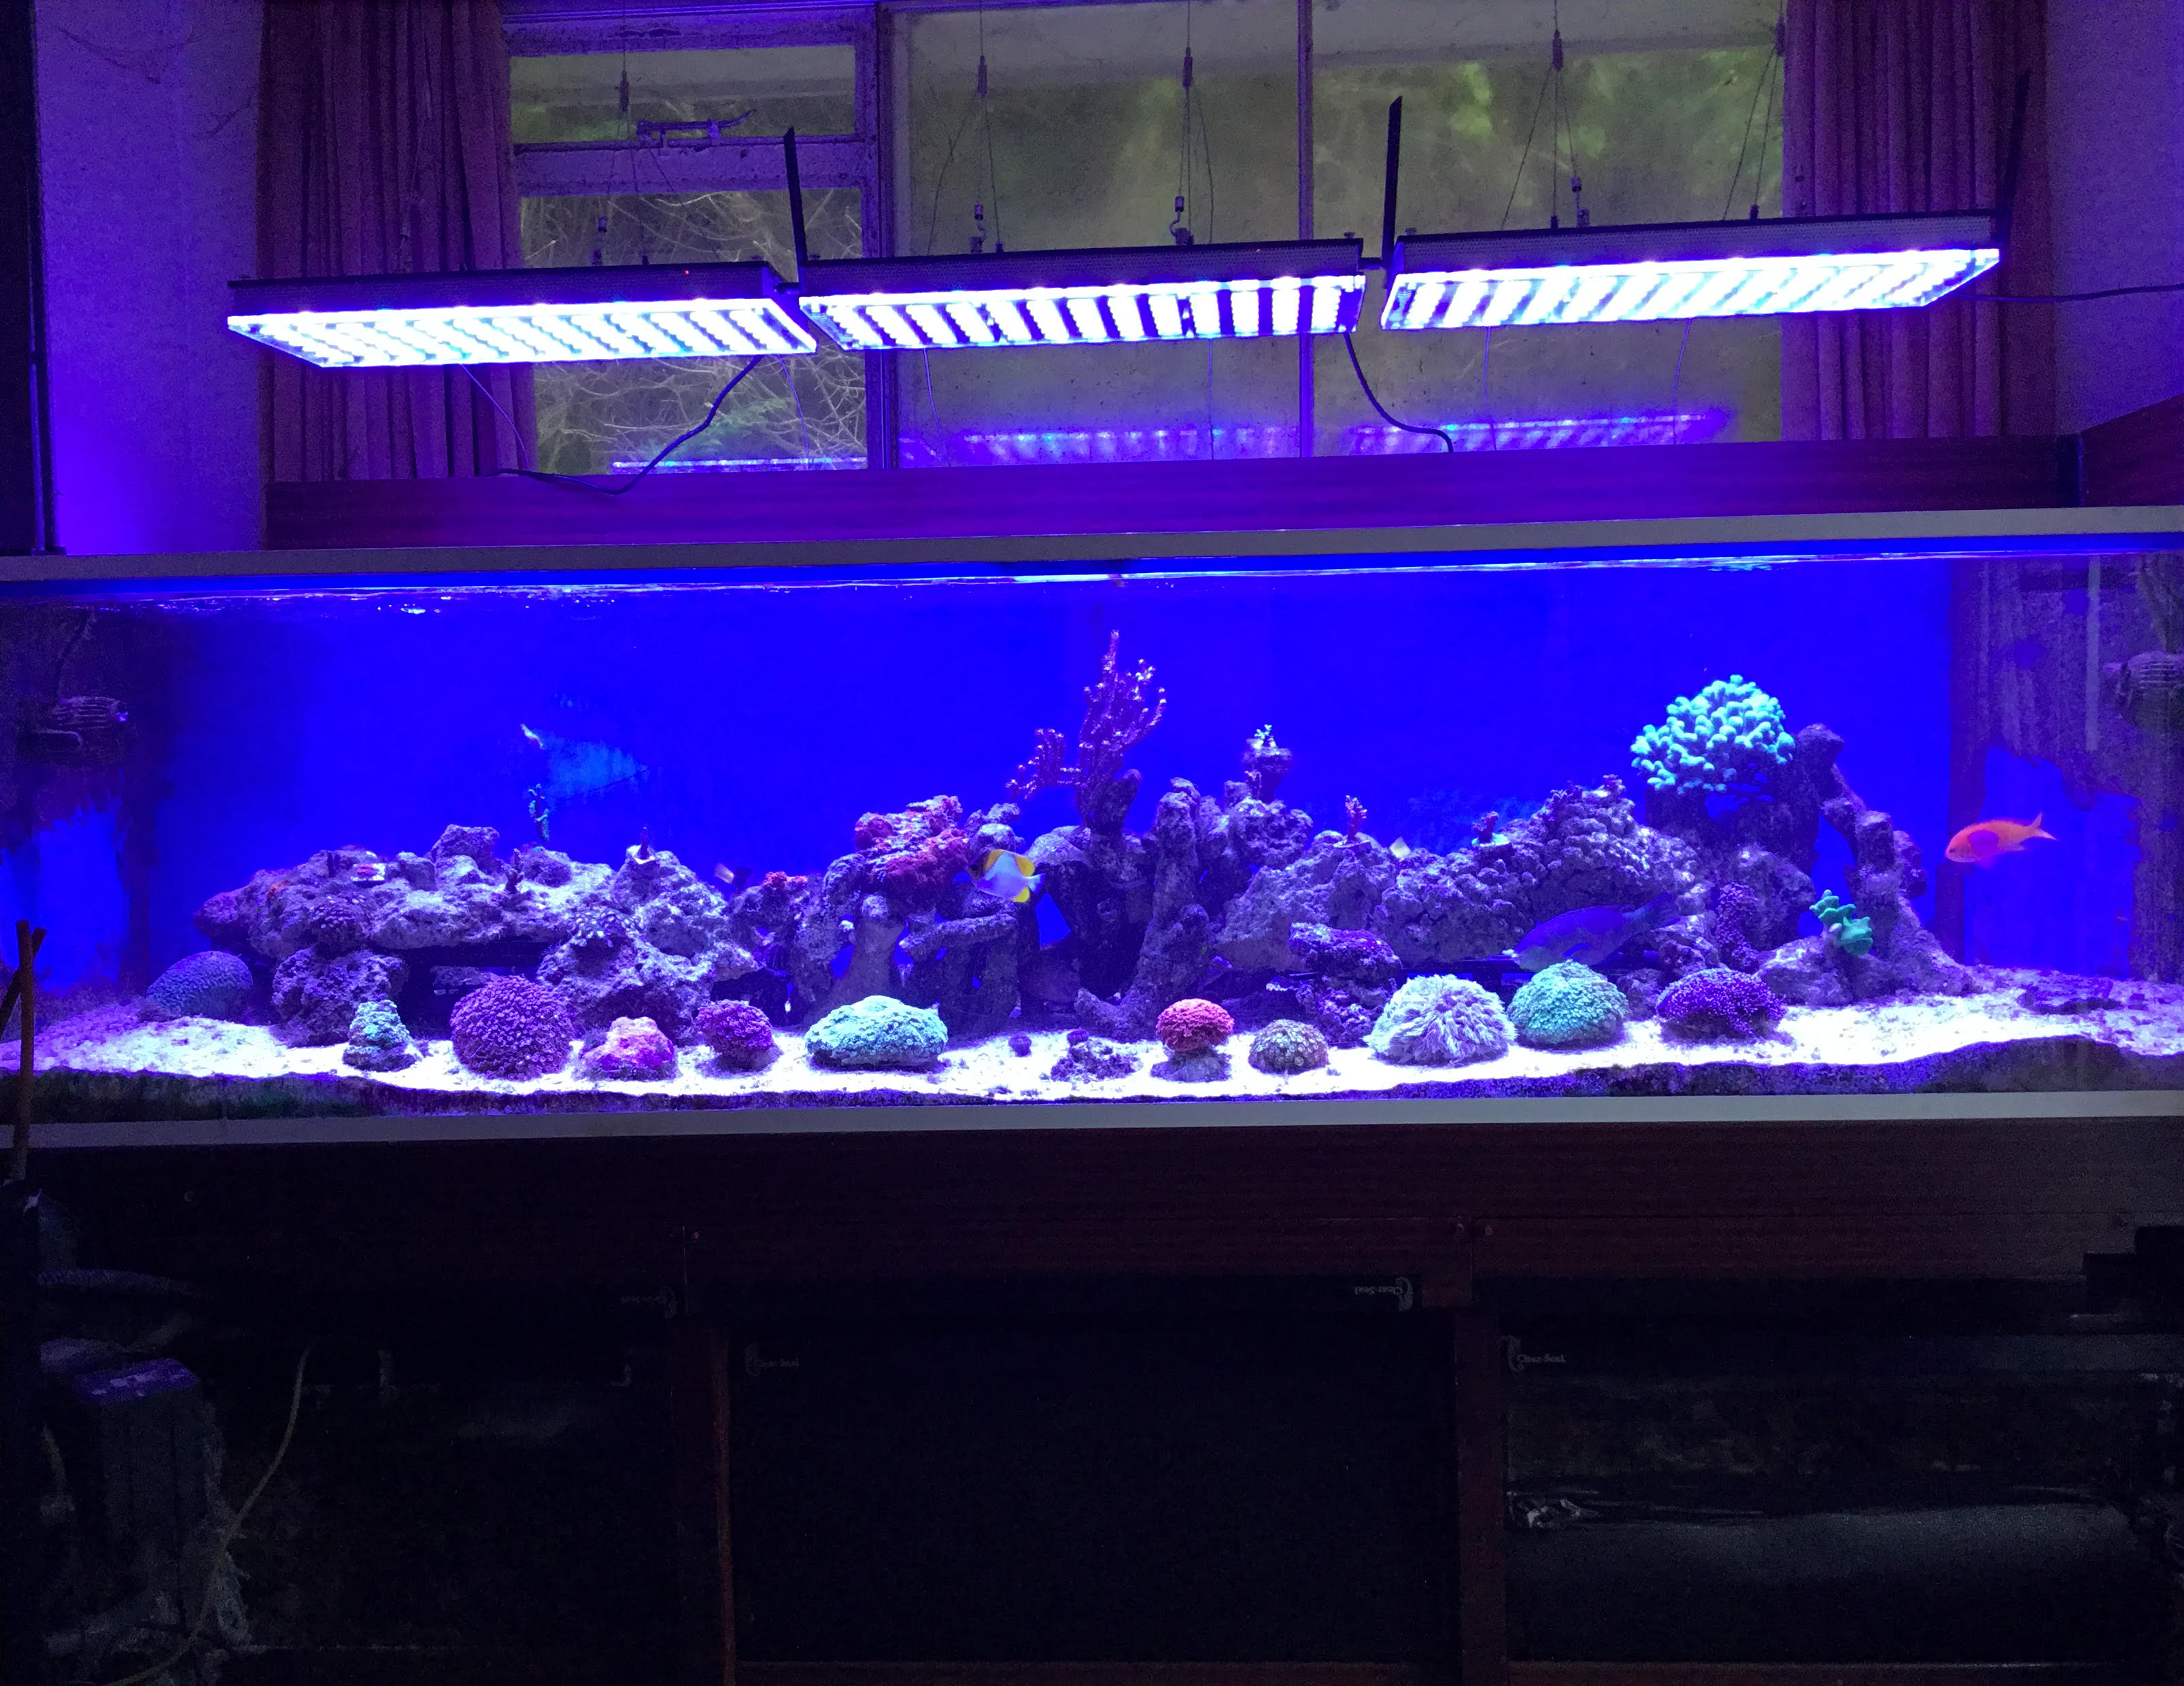 royaume uni client tr s satisfait de ses lumi res reef vlanx v3 atlantik clairage d 39 aquarium. Black Bedroom Furniture Sets. Home Design Ideas